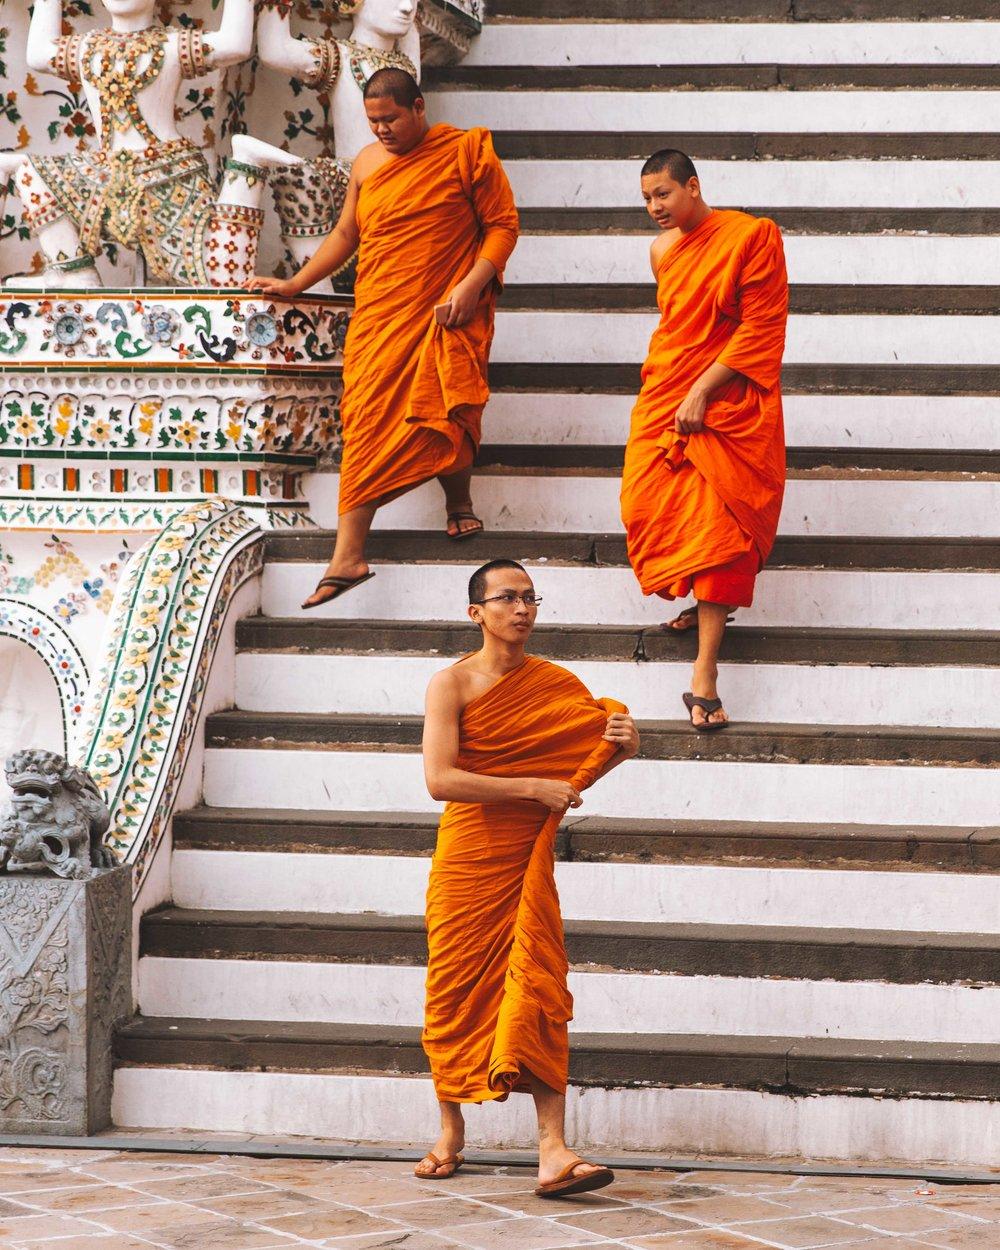 post-bangkok-9613.jpg